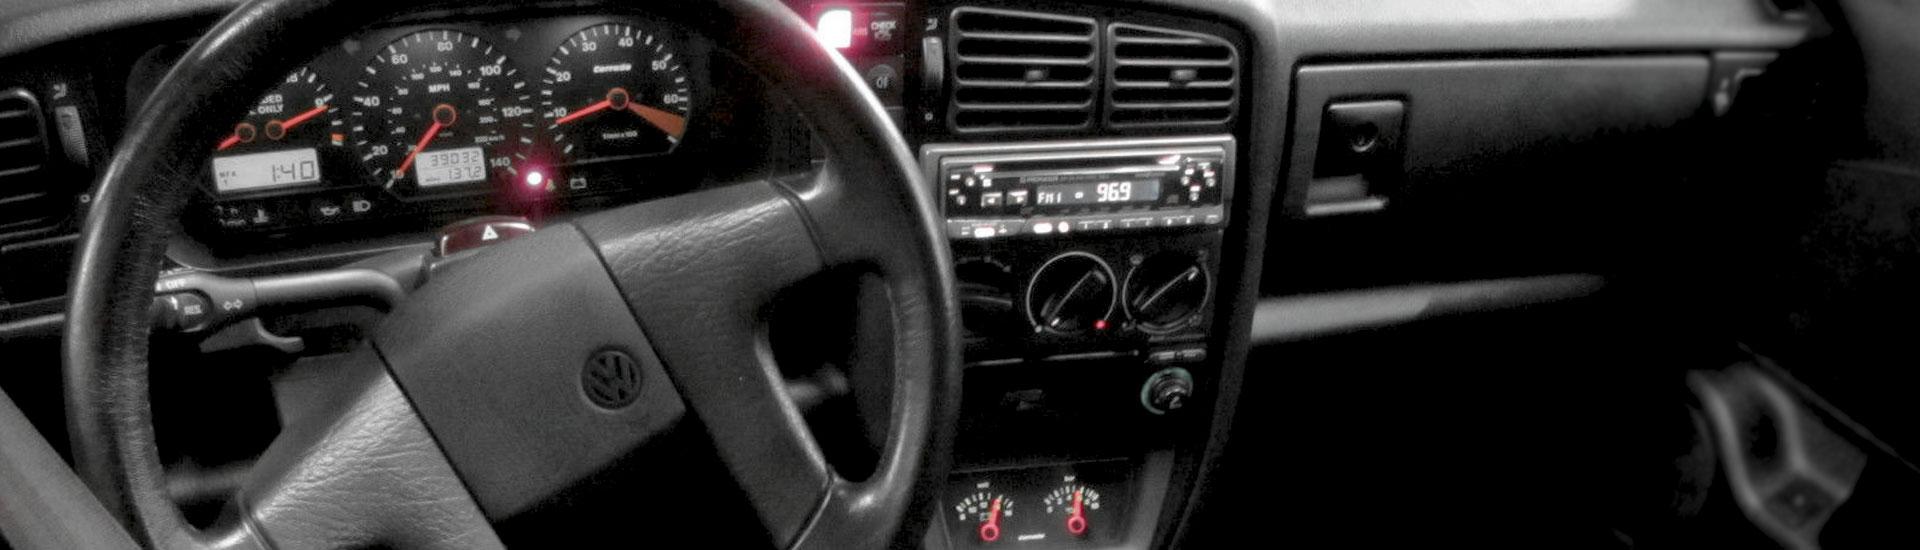 Volkswagen corrado dash kits custom volkswagen corrado dash kit volkswagen corrado custom dash kits biocorpaavc